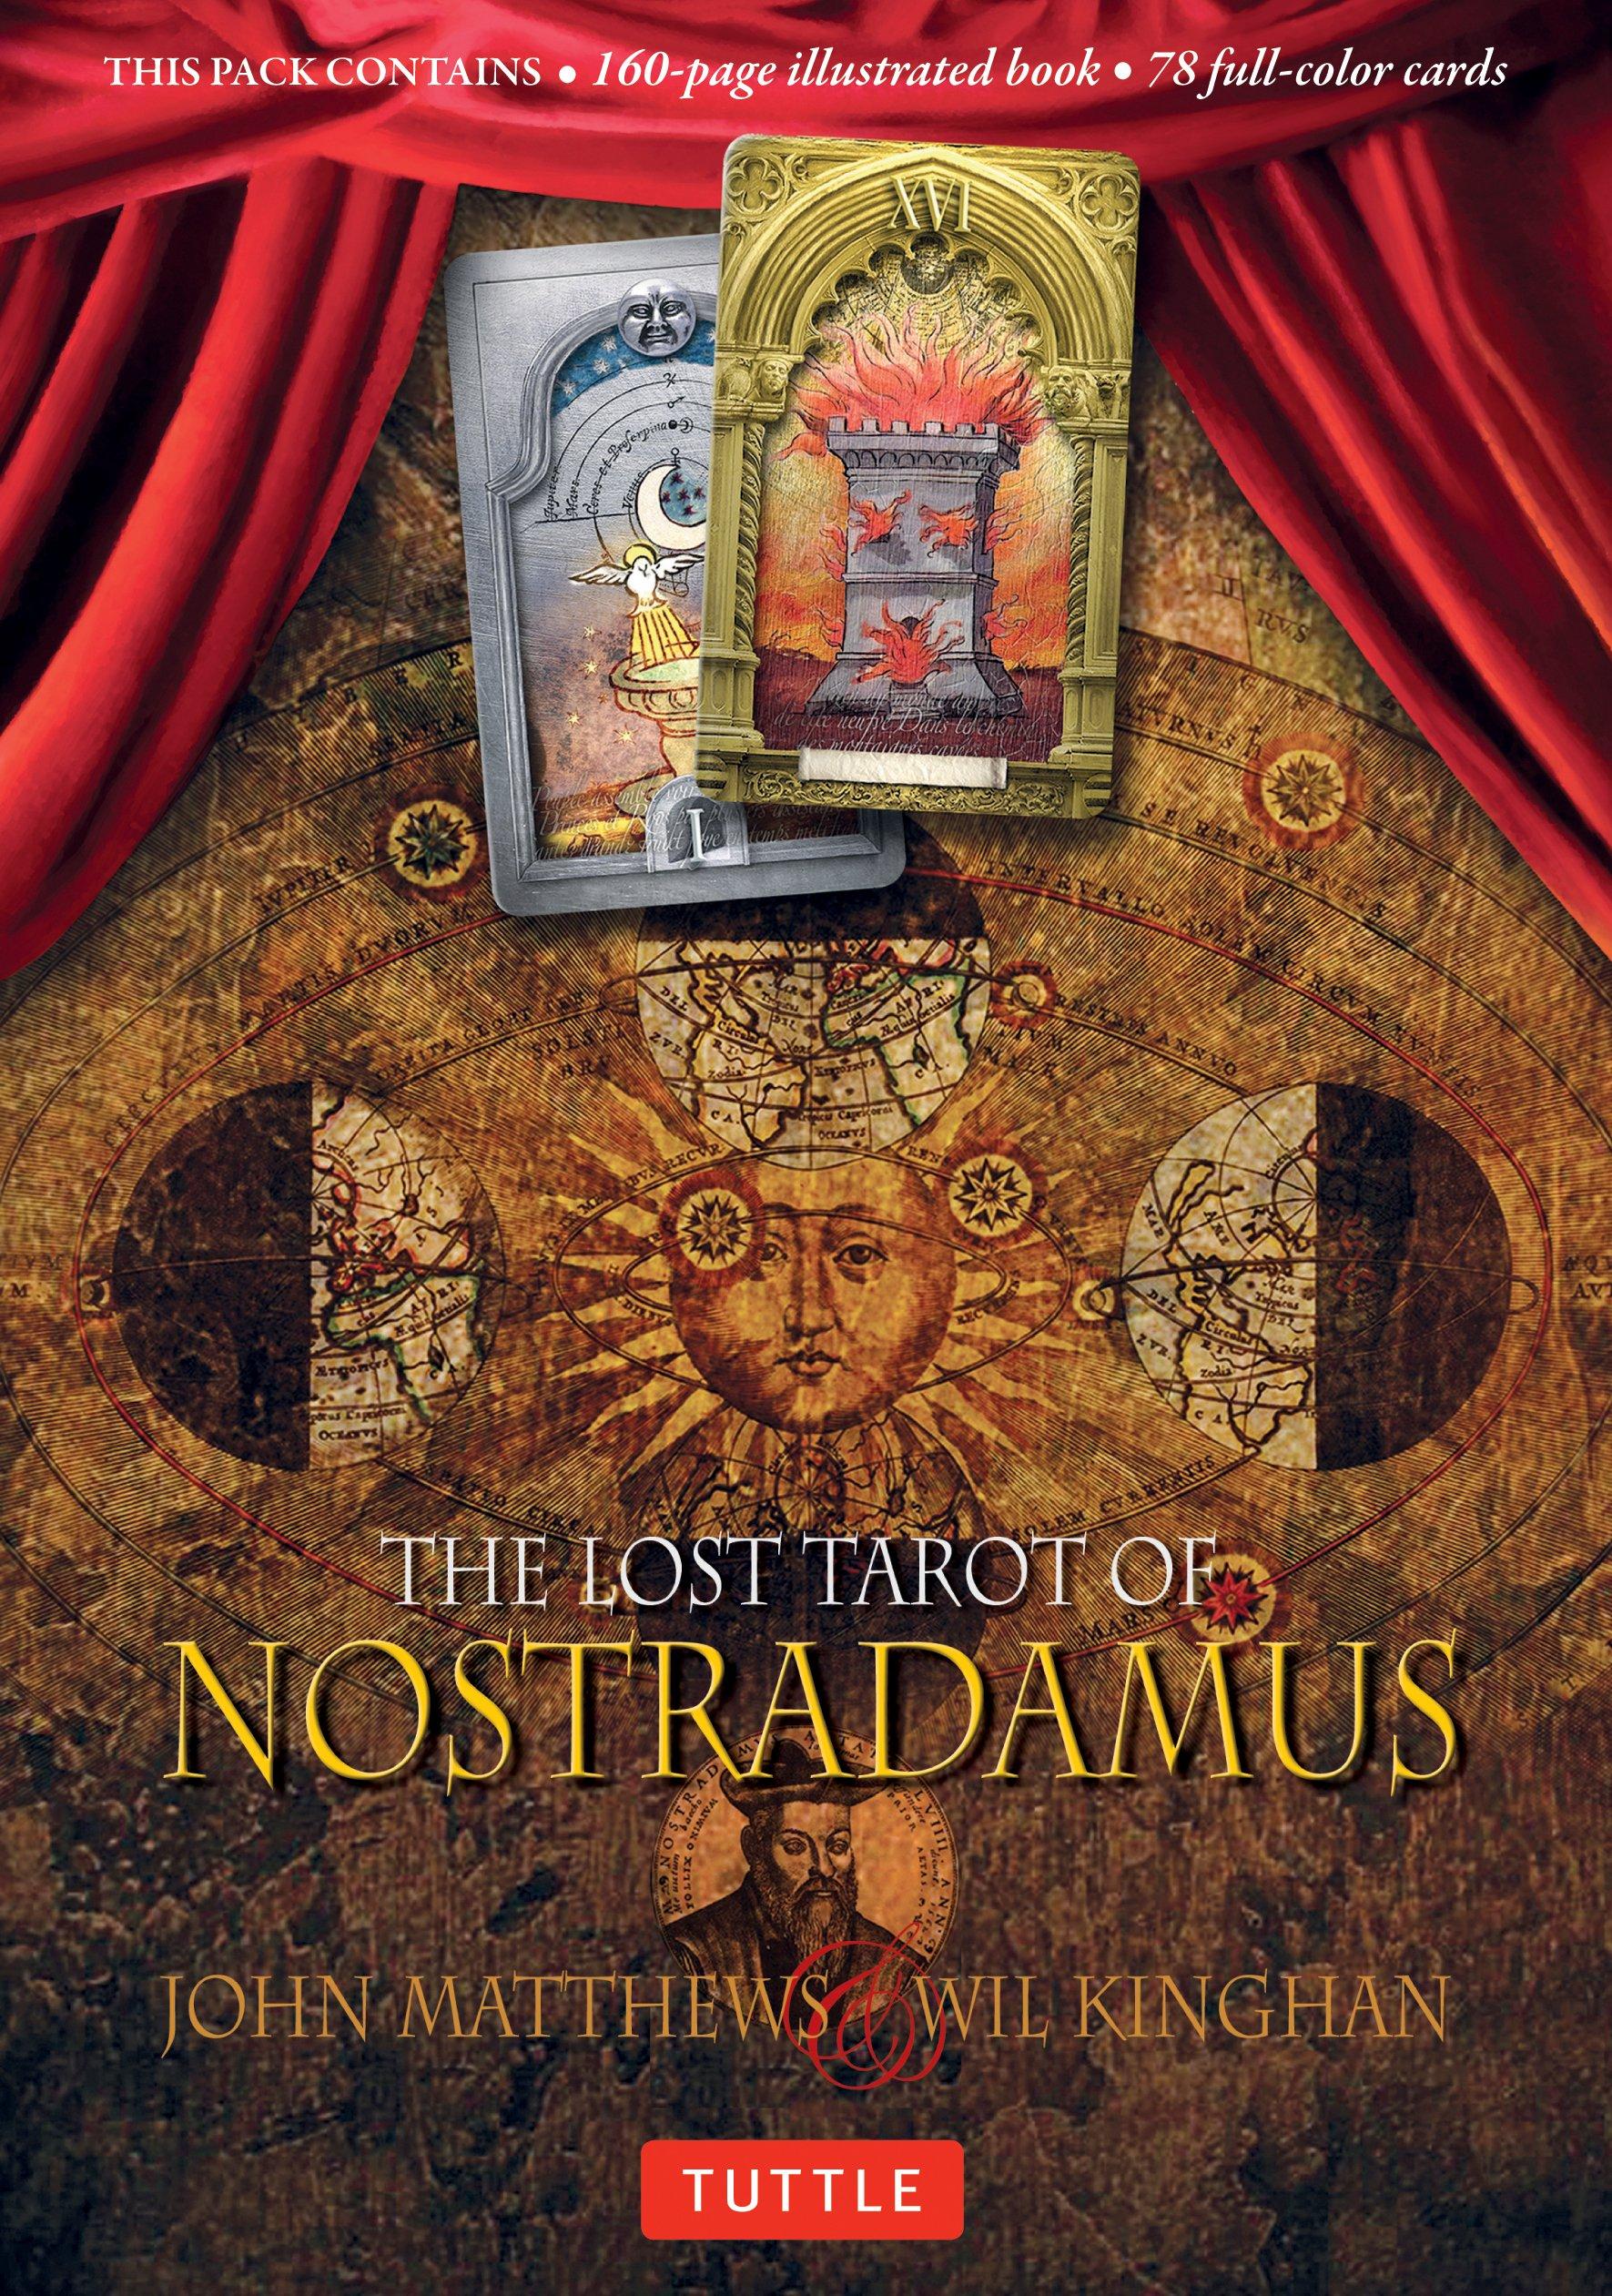 LOST TAROT OF NOSTRADAMUS BOOK: Amazon.es: Matthews, John: Libros en idiomas extranjeros